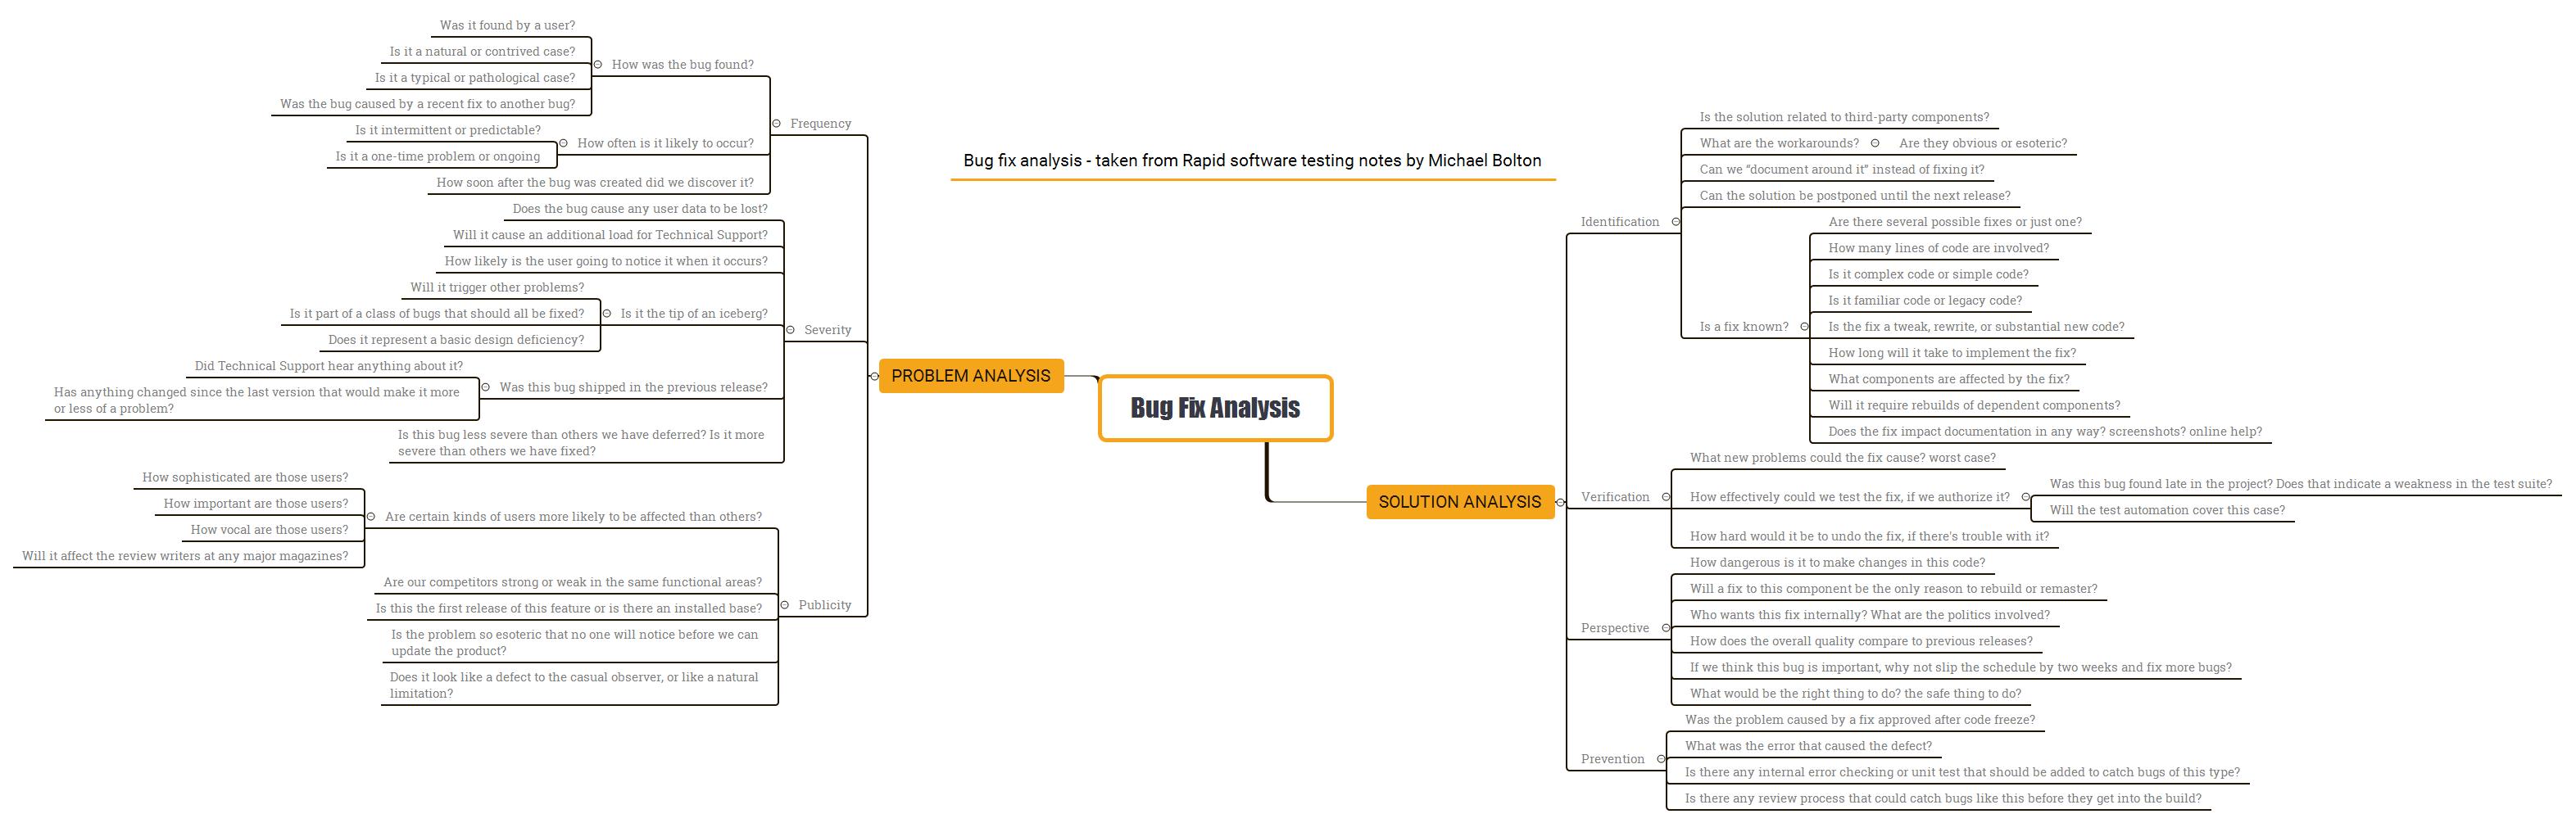 Bug Fix Analysis